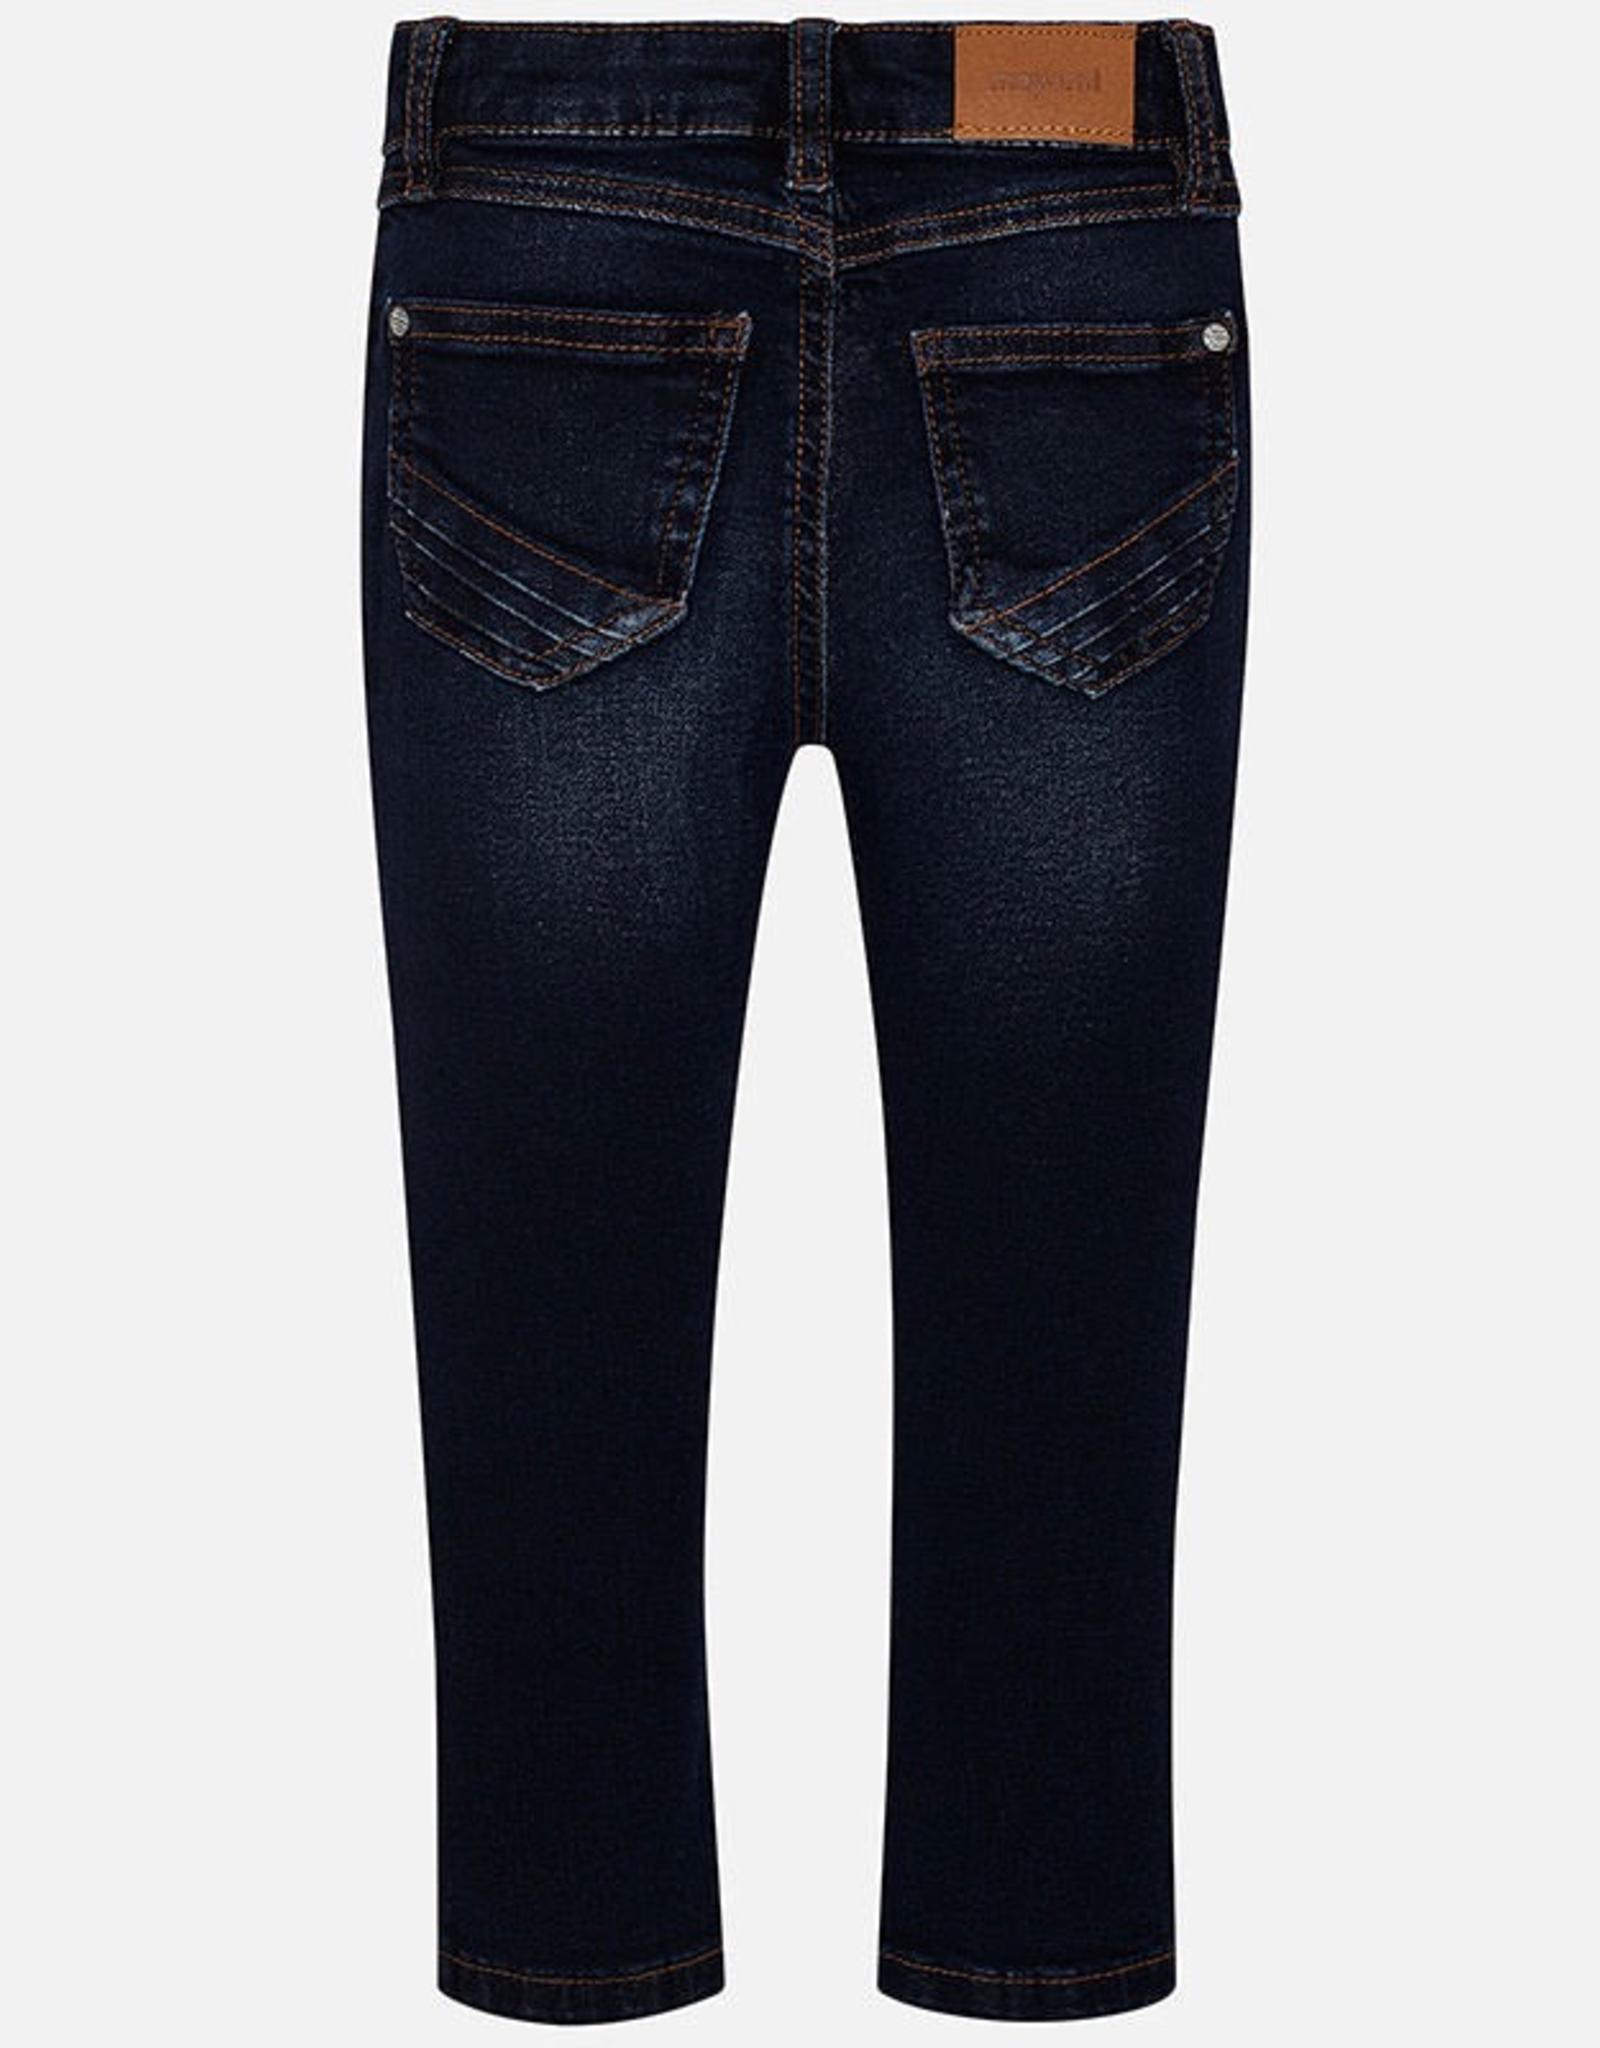 Mayoral Basic Skinny Pants for Girls